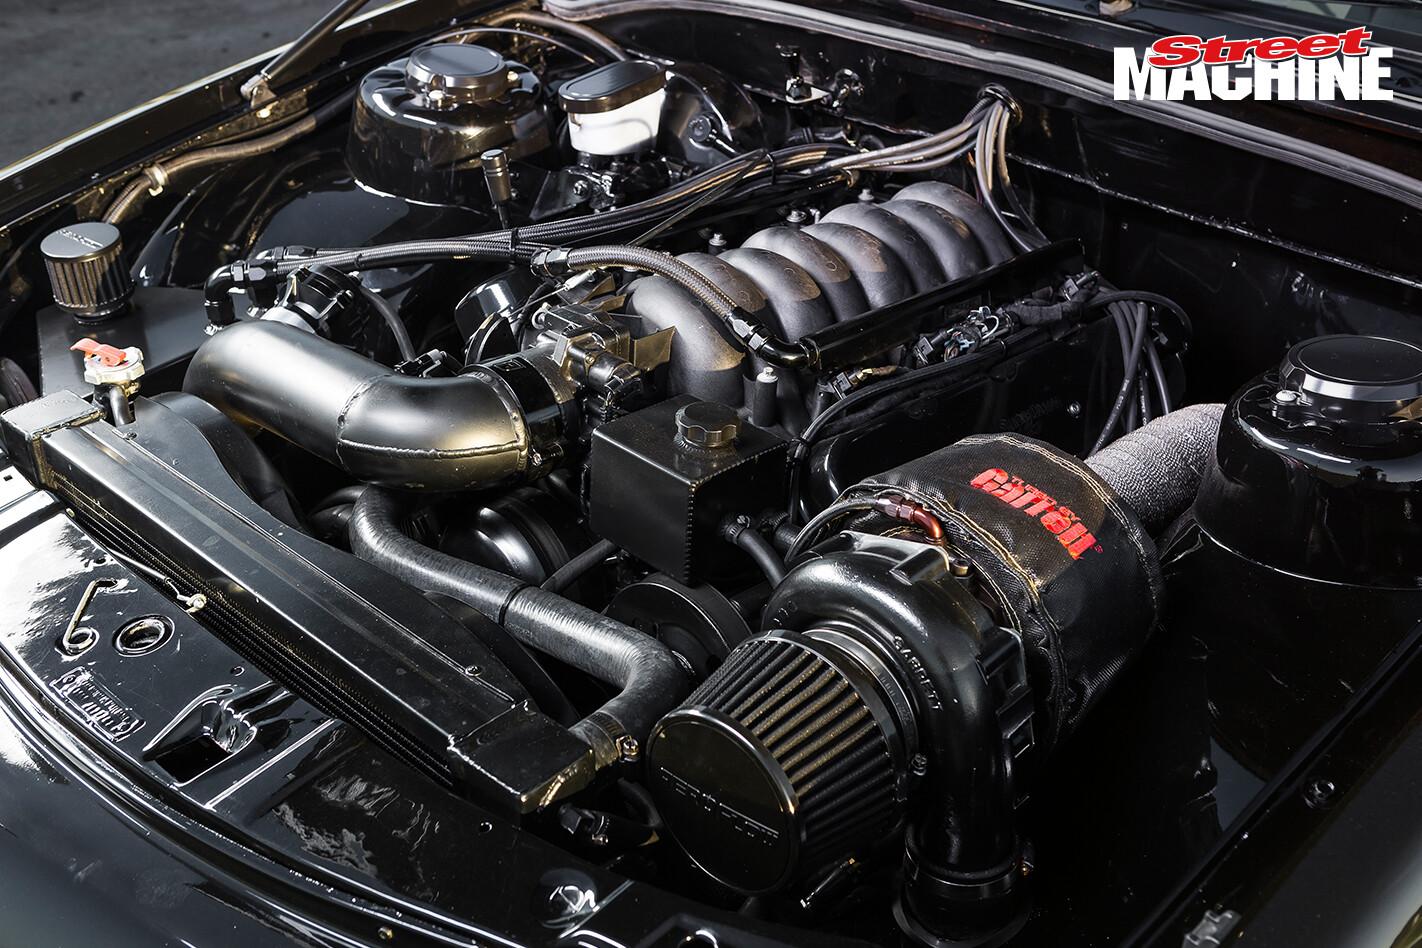 VK Commodore Brocky LS 1 Turbo Engine 2 Nw Jpg